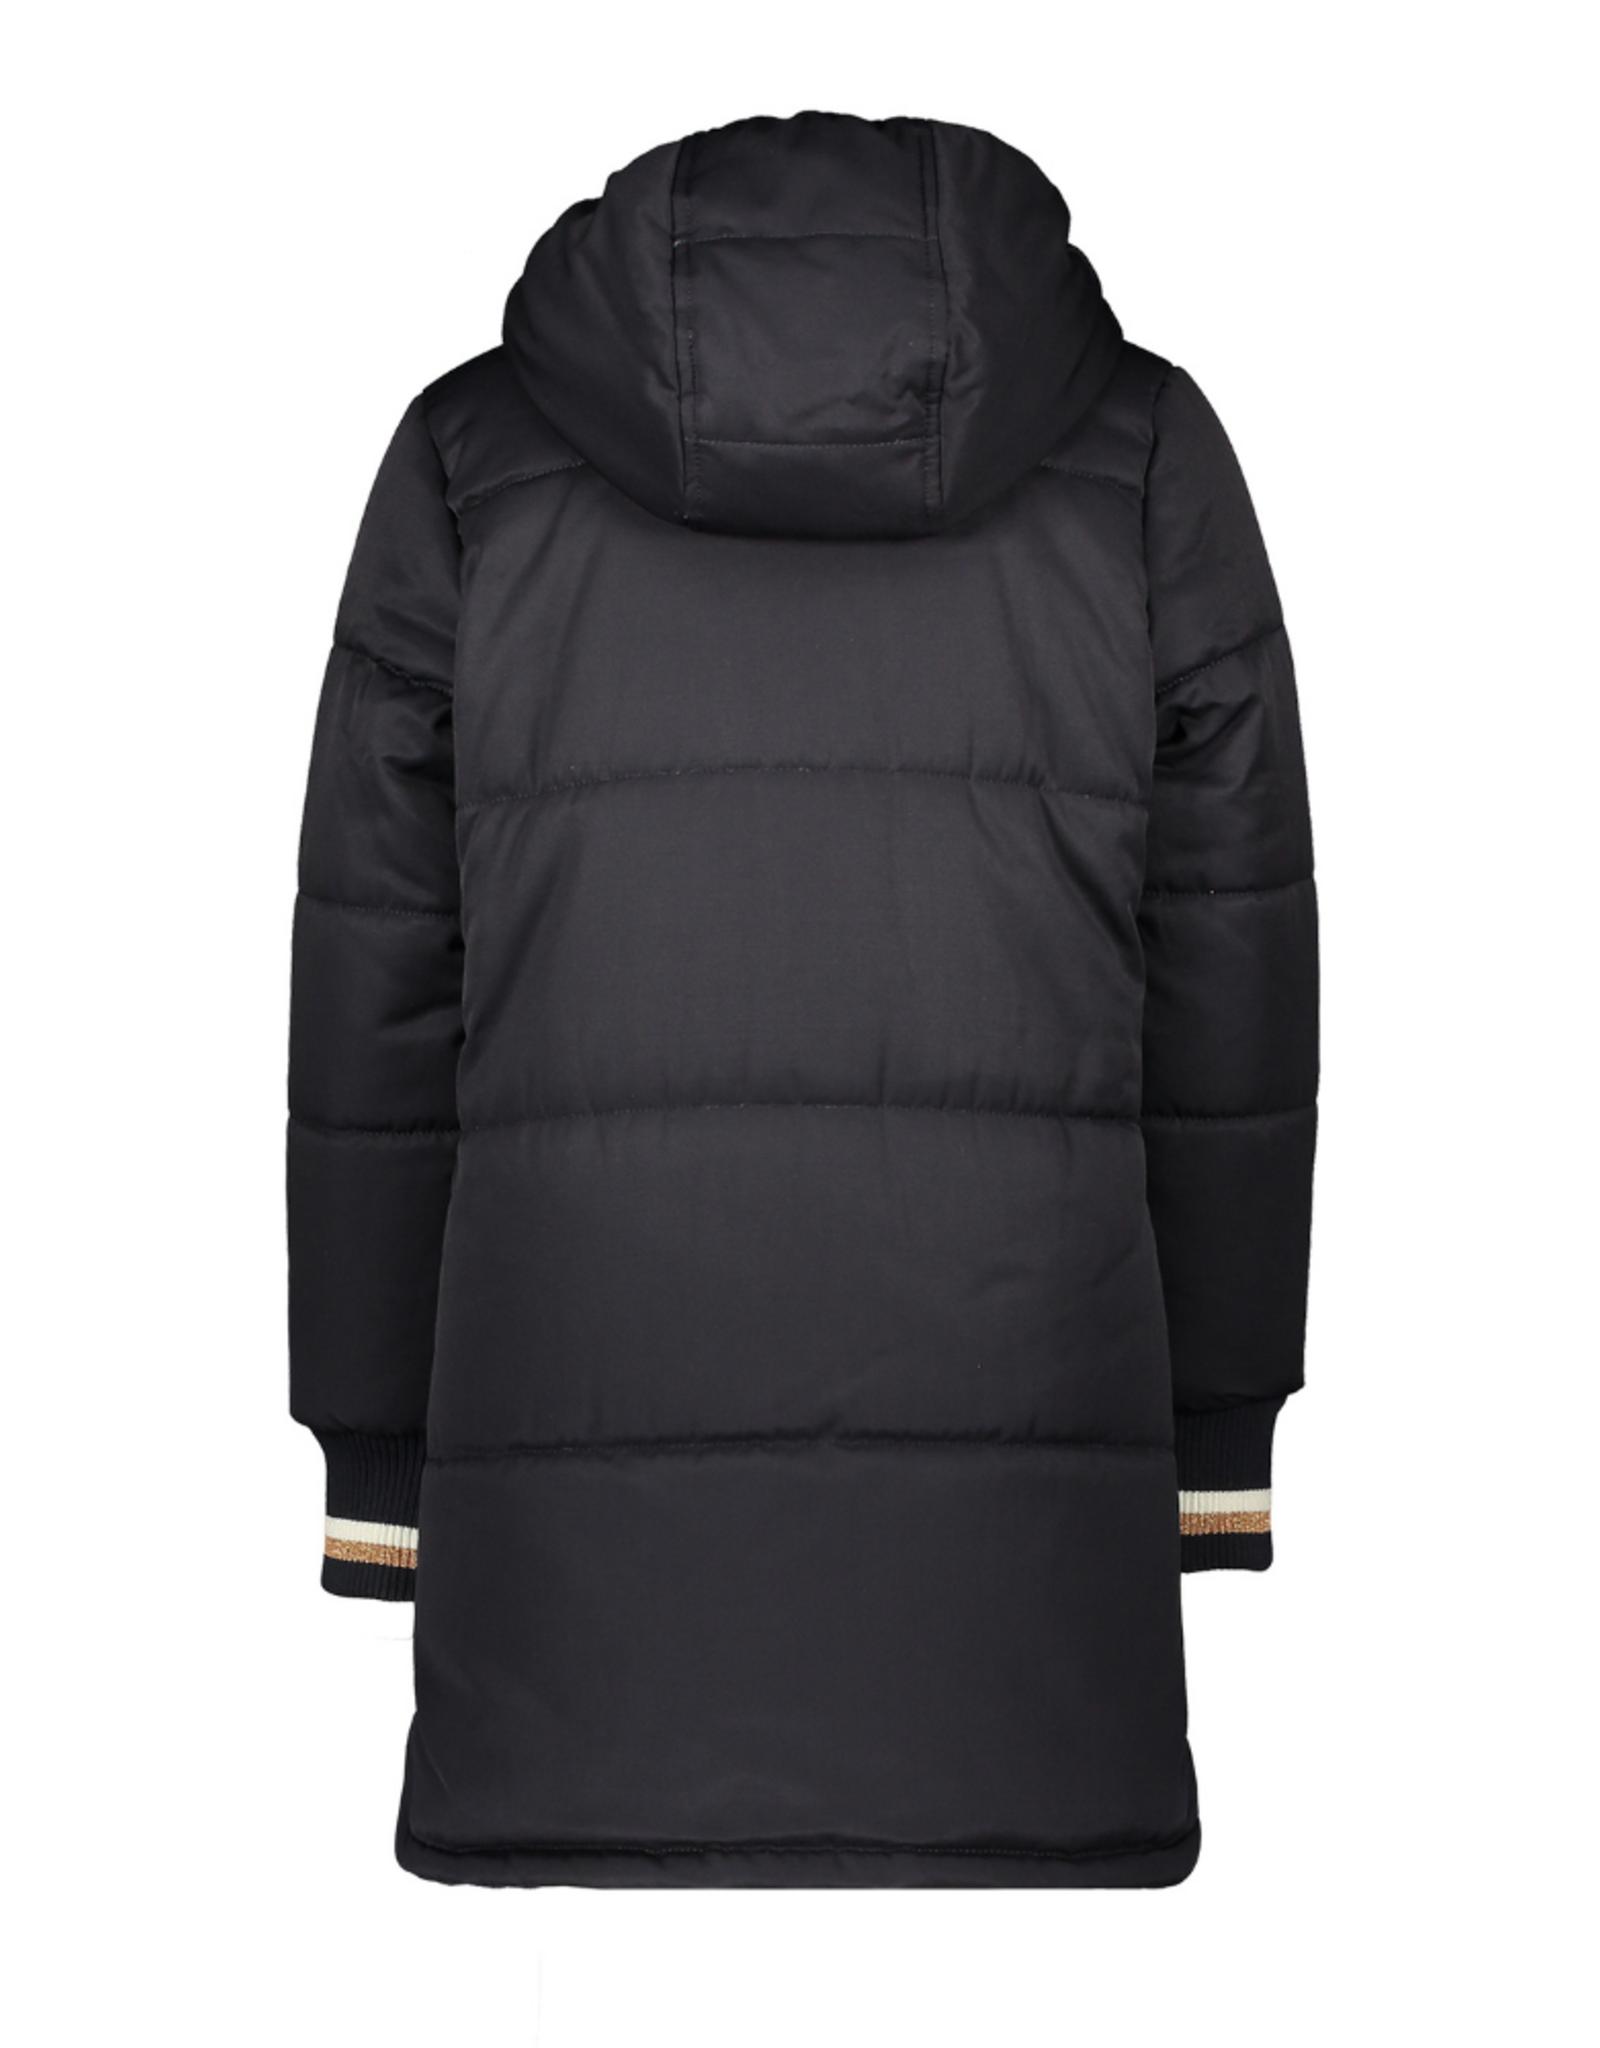 Moodstreet Moodstreet jacket 5211 navy